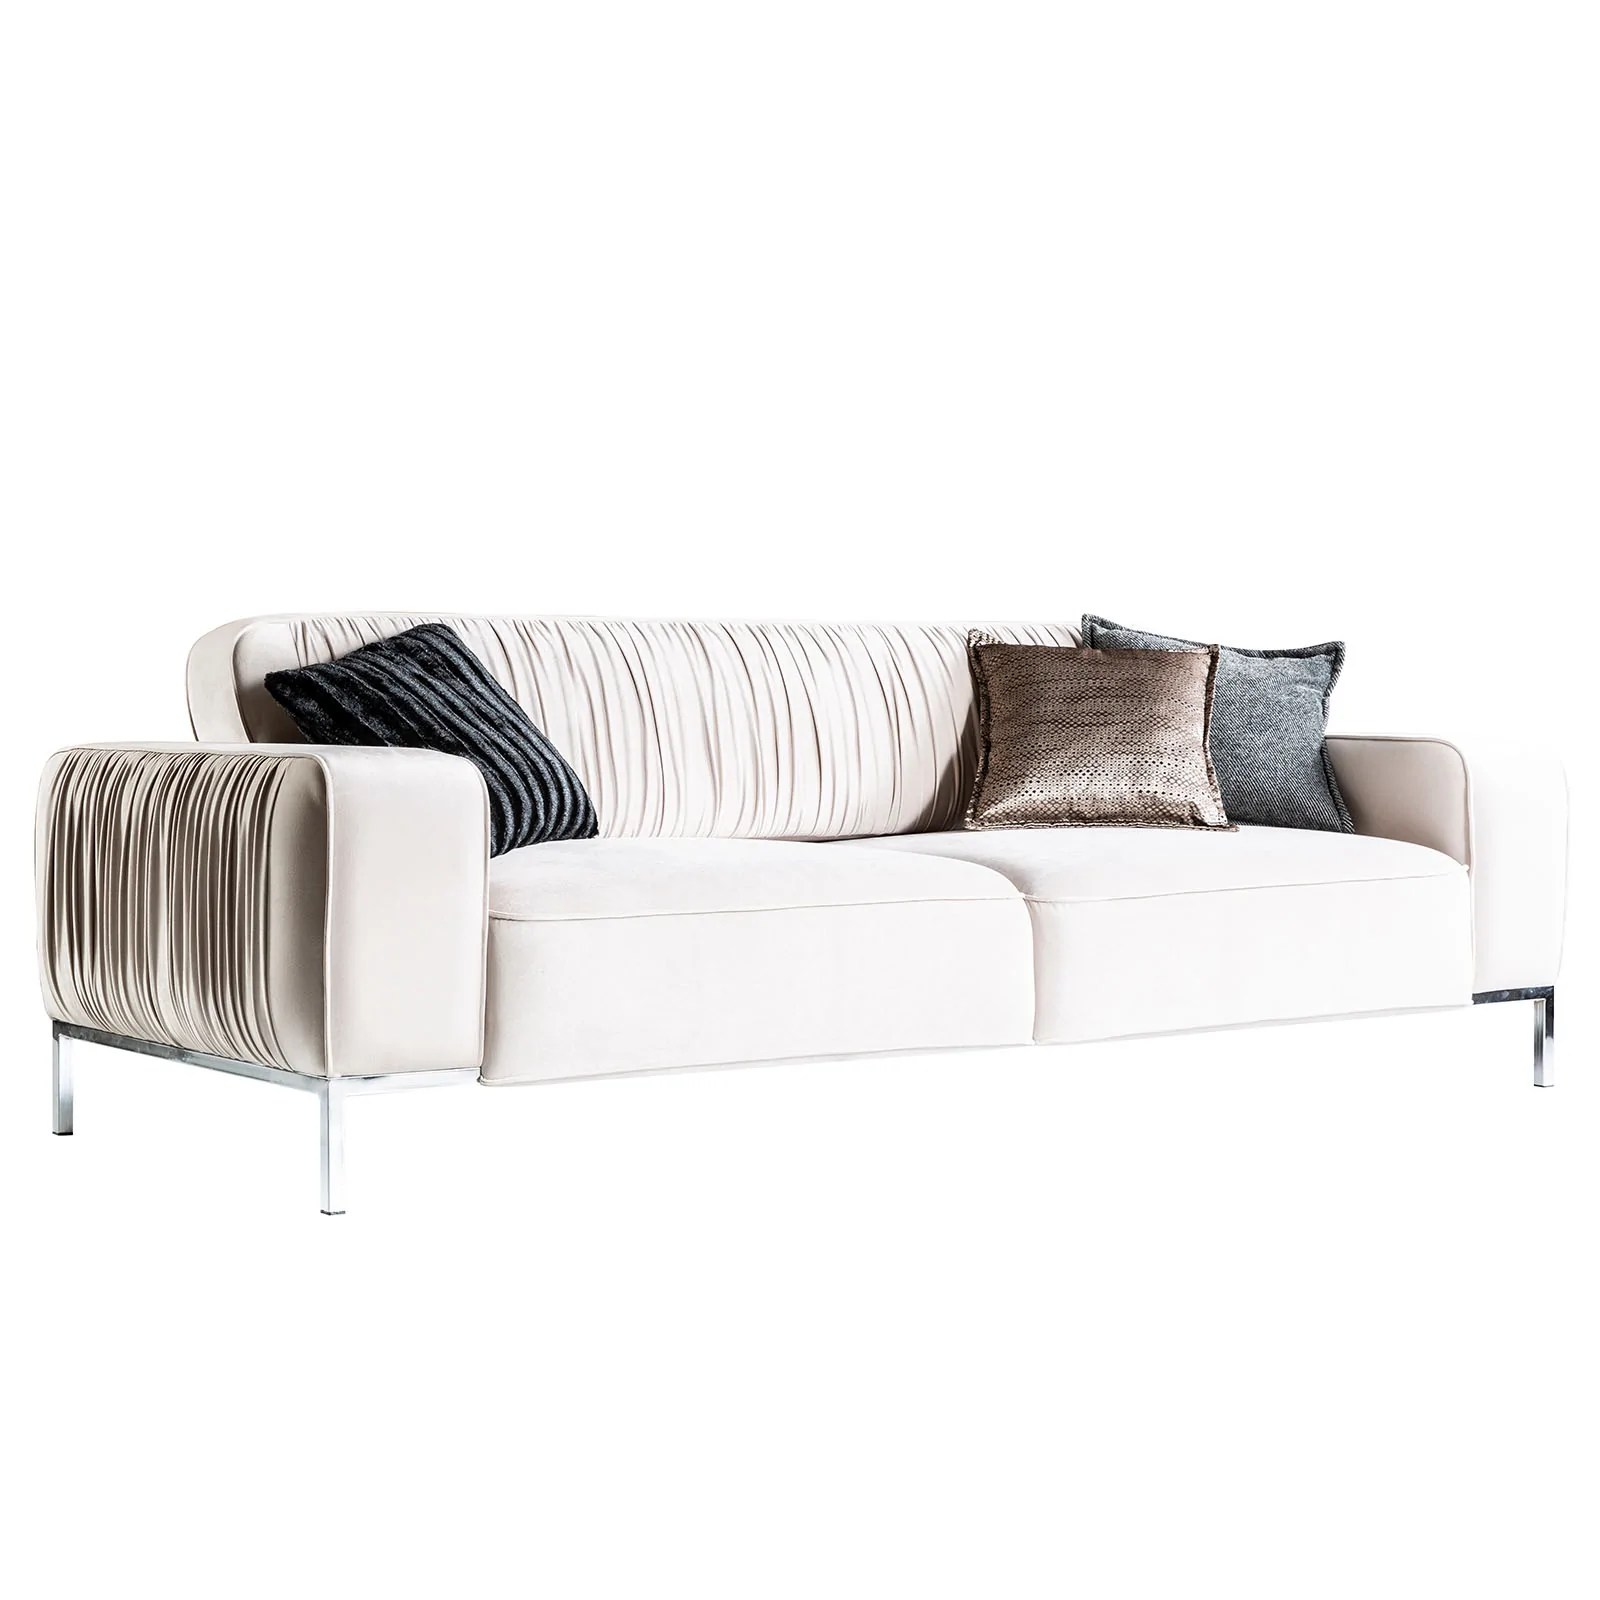 Ebarza 3+3+1+1 BERETTA sofa set Beretta 001 - ebarza on Beretta Outdoor Living id=74810